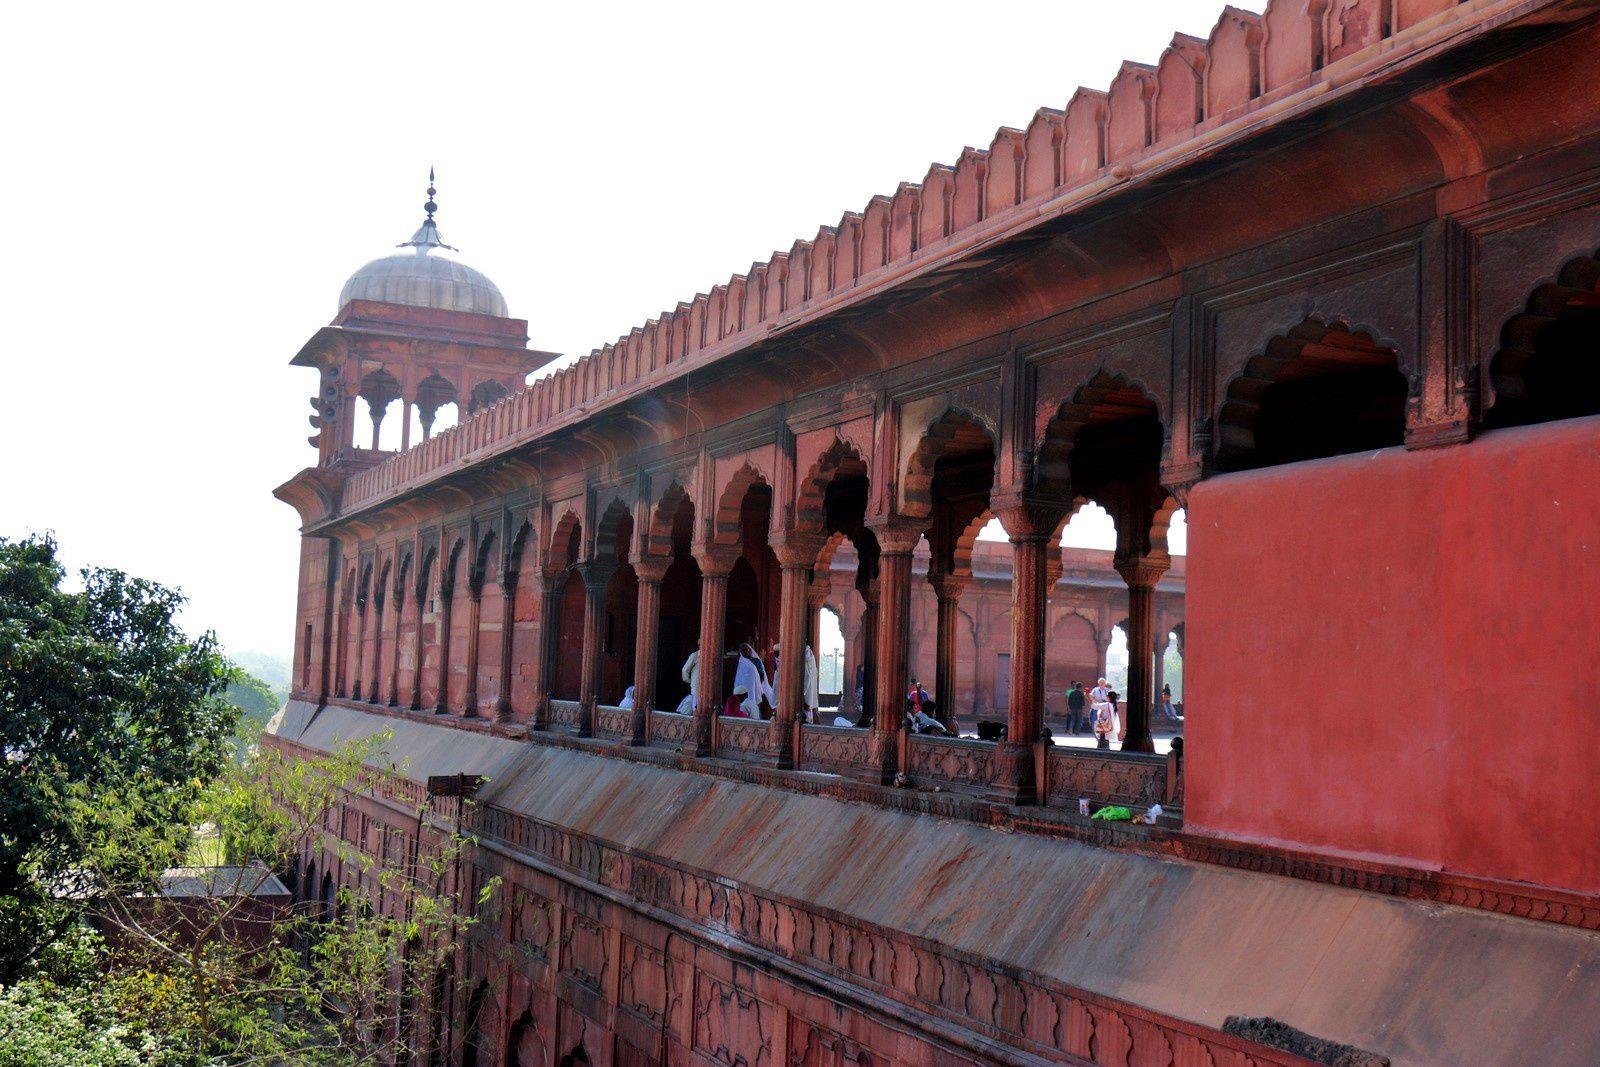 Arcades vues de l'extérieur de la mosquée